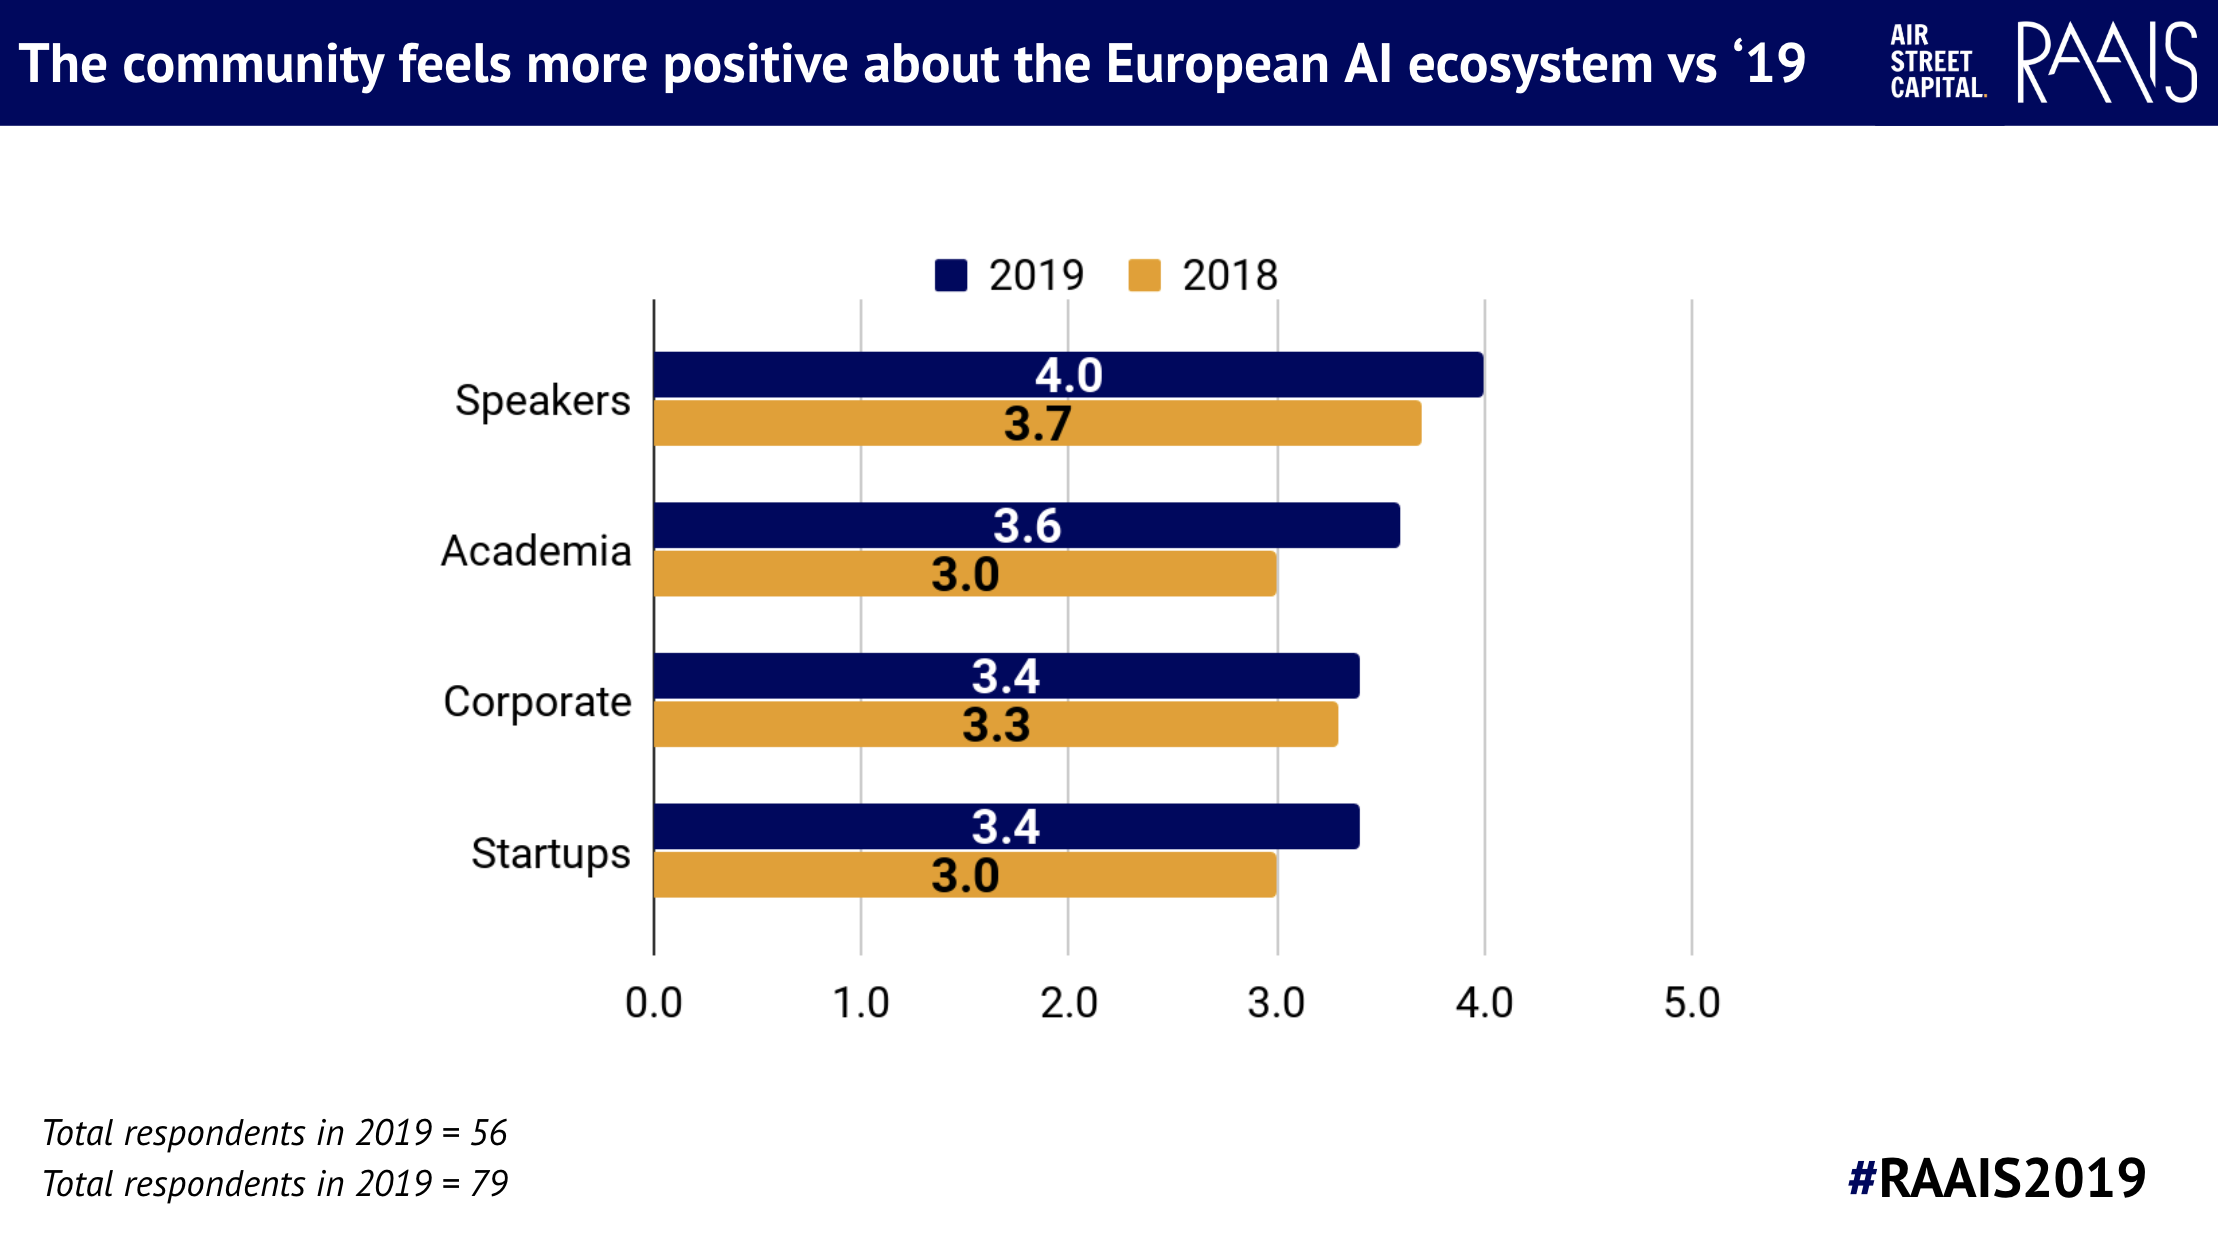 RAAIS 2019 - how do feel about European AI?